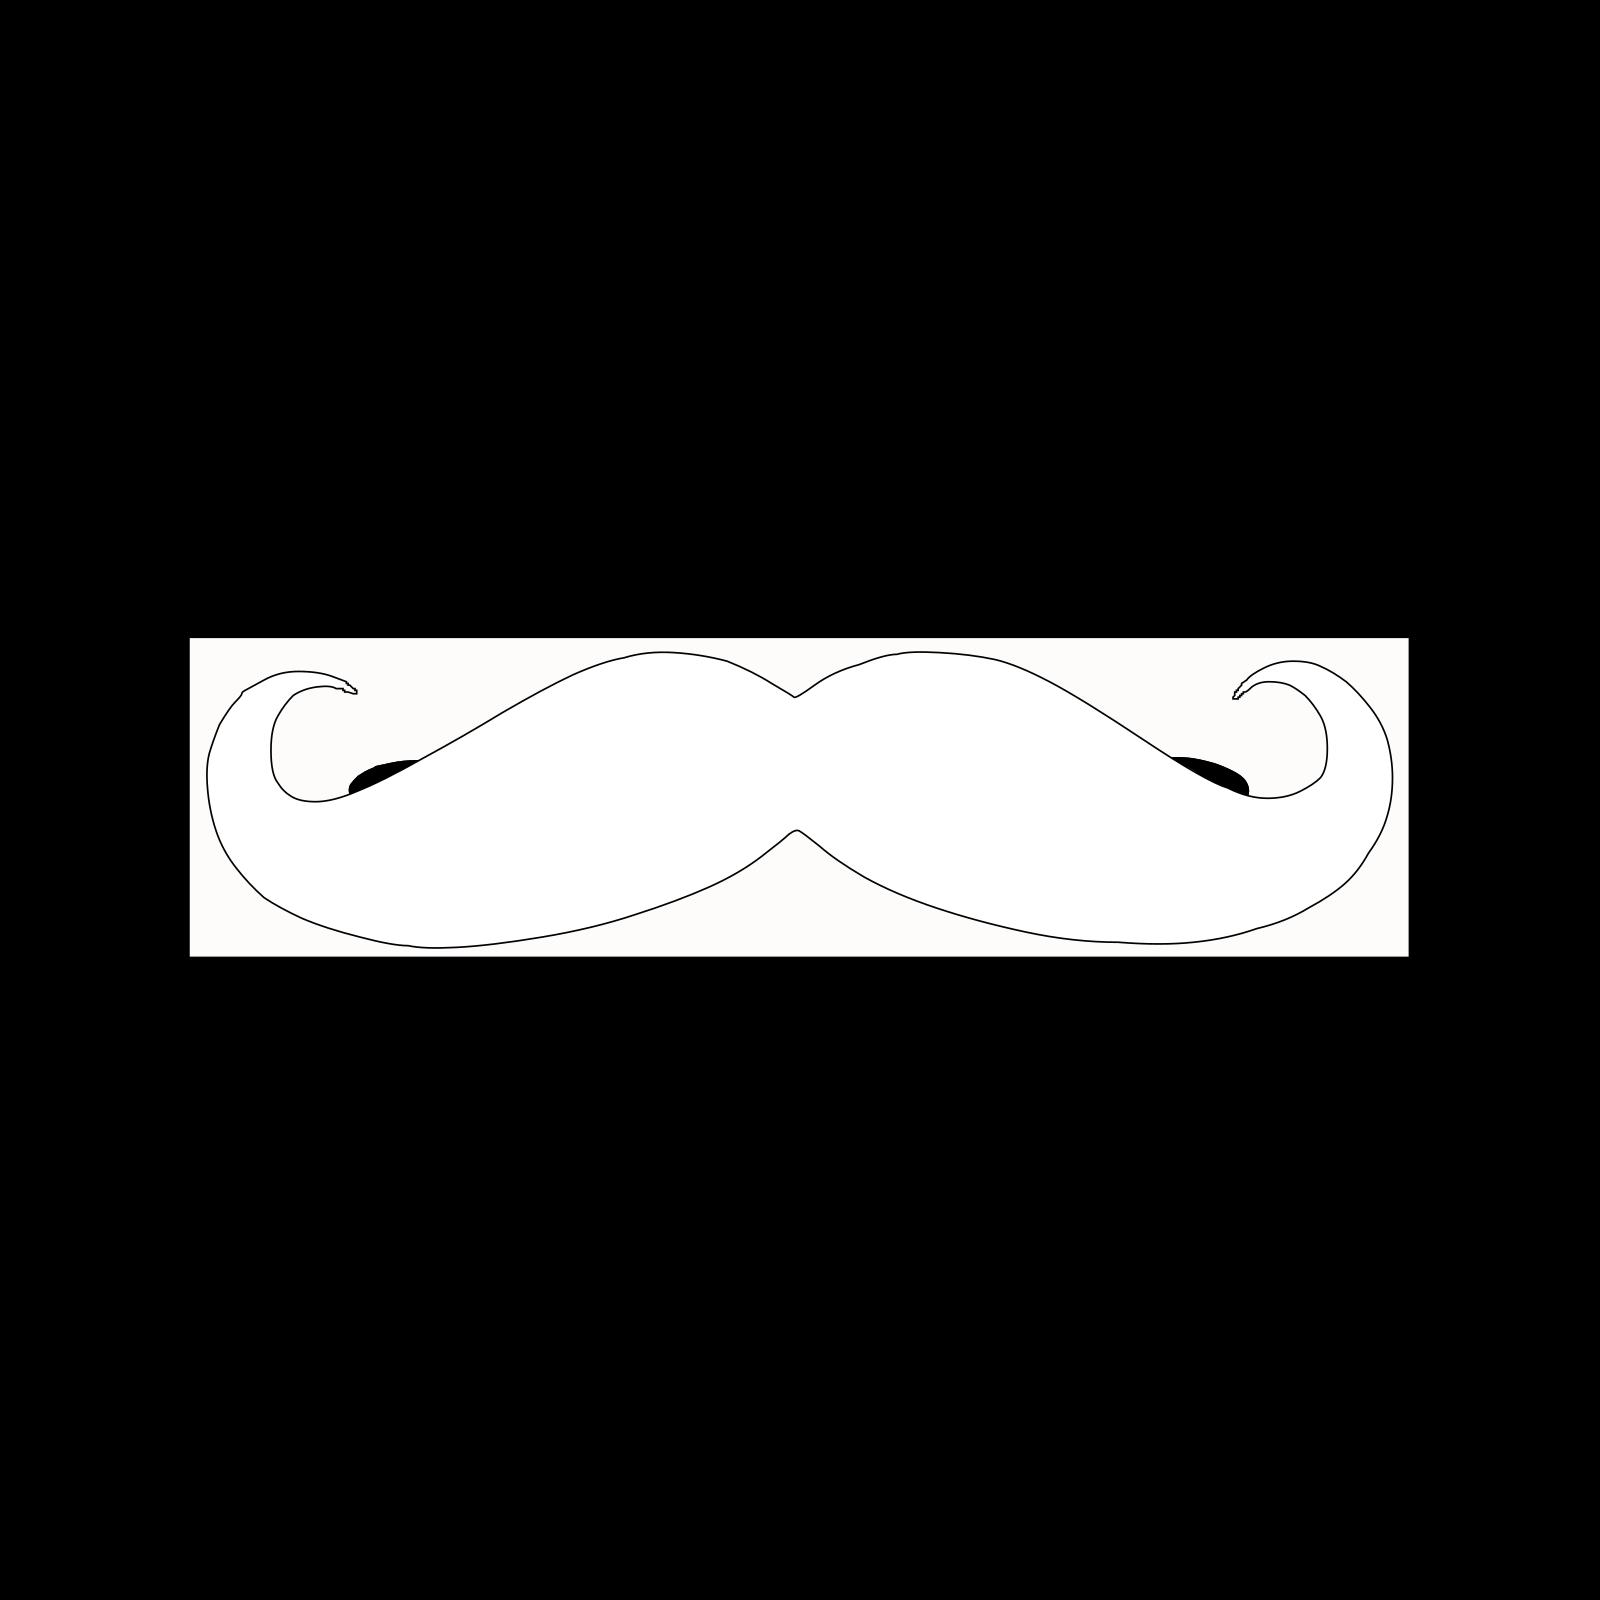 Mustache outline. Clip art icon and